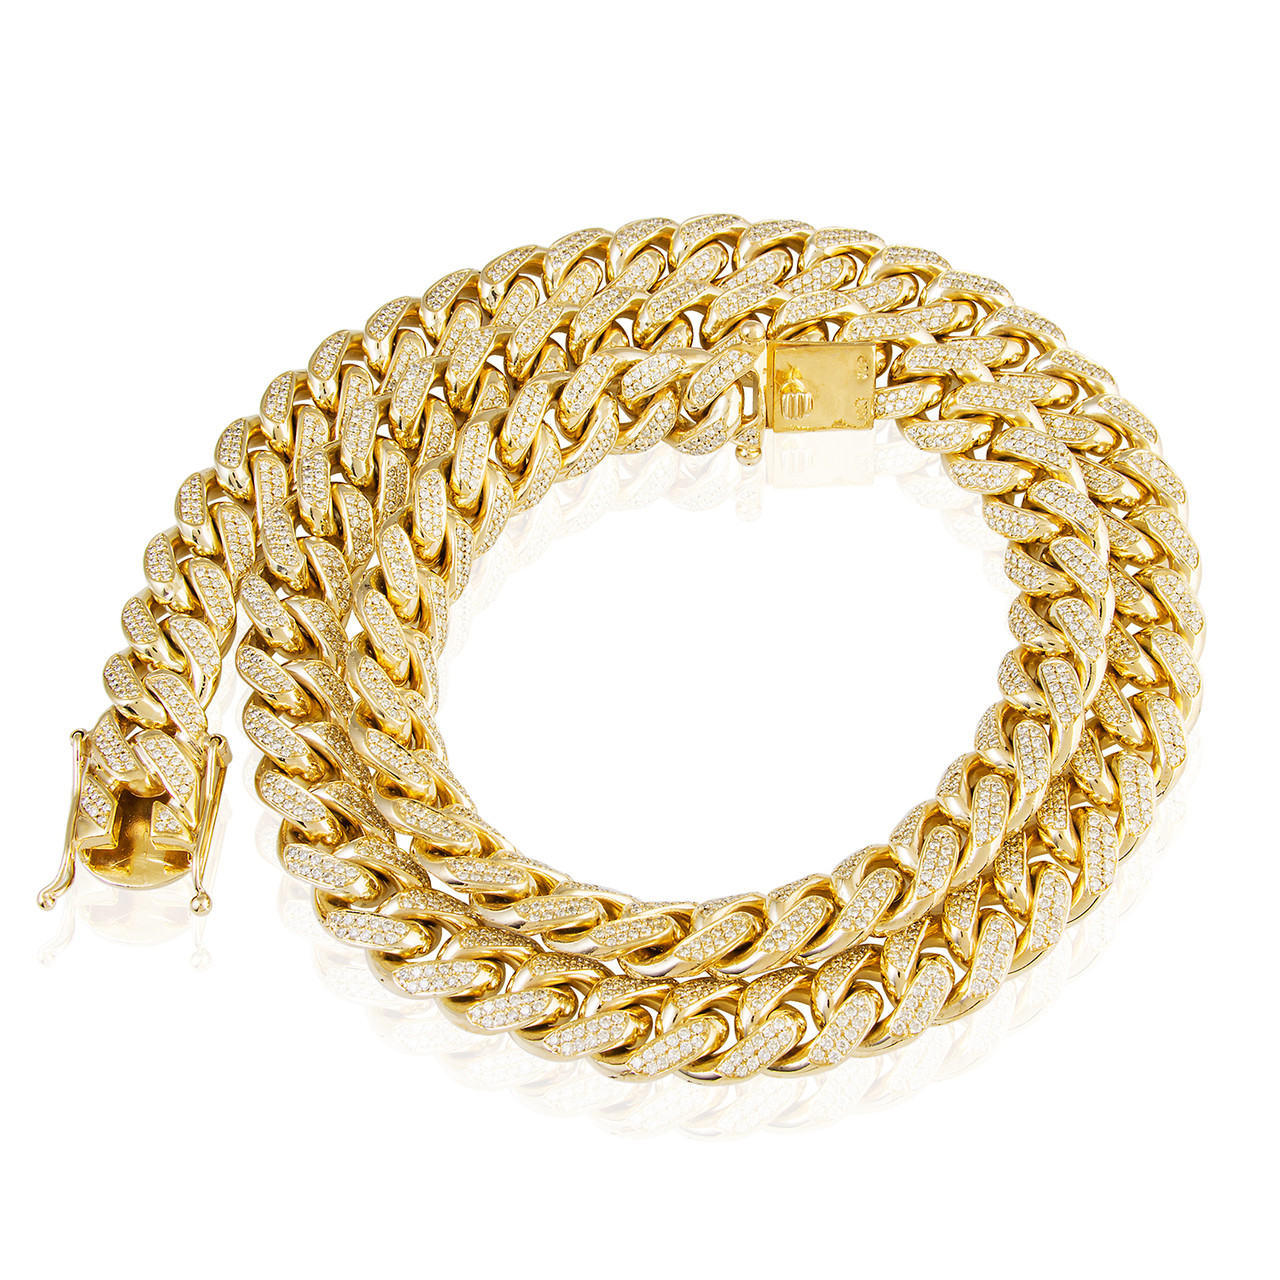 10k Gold Cuban Link Chain >> 10k Yellow Gold 26ct Diamond 14 5mm Cuban Link Chain 31in